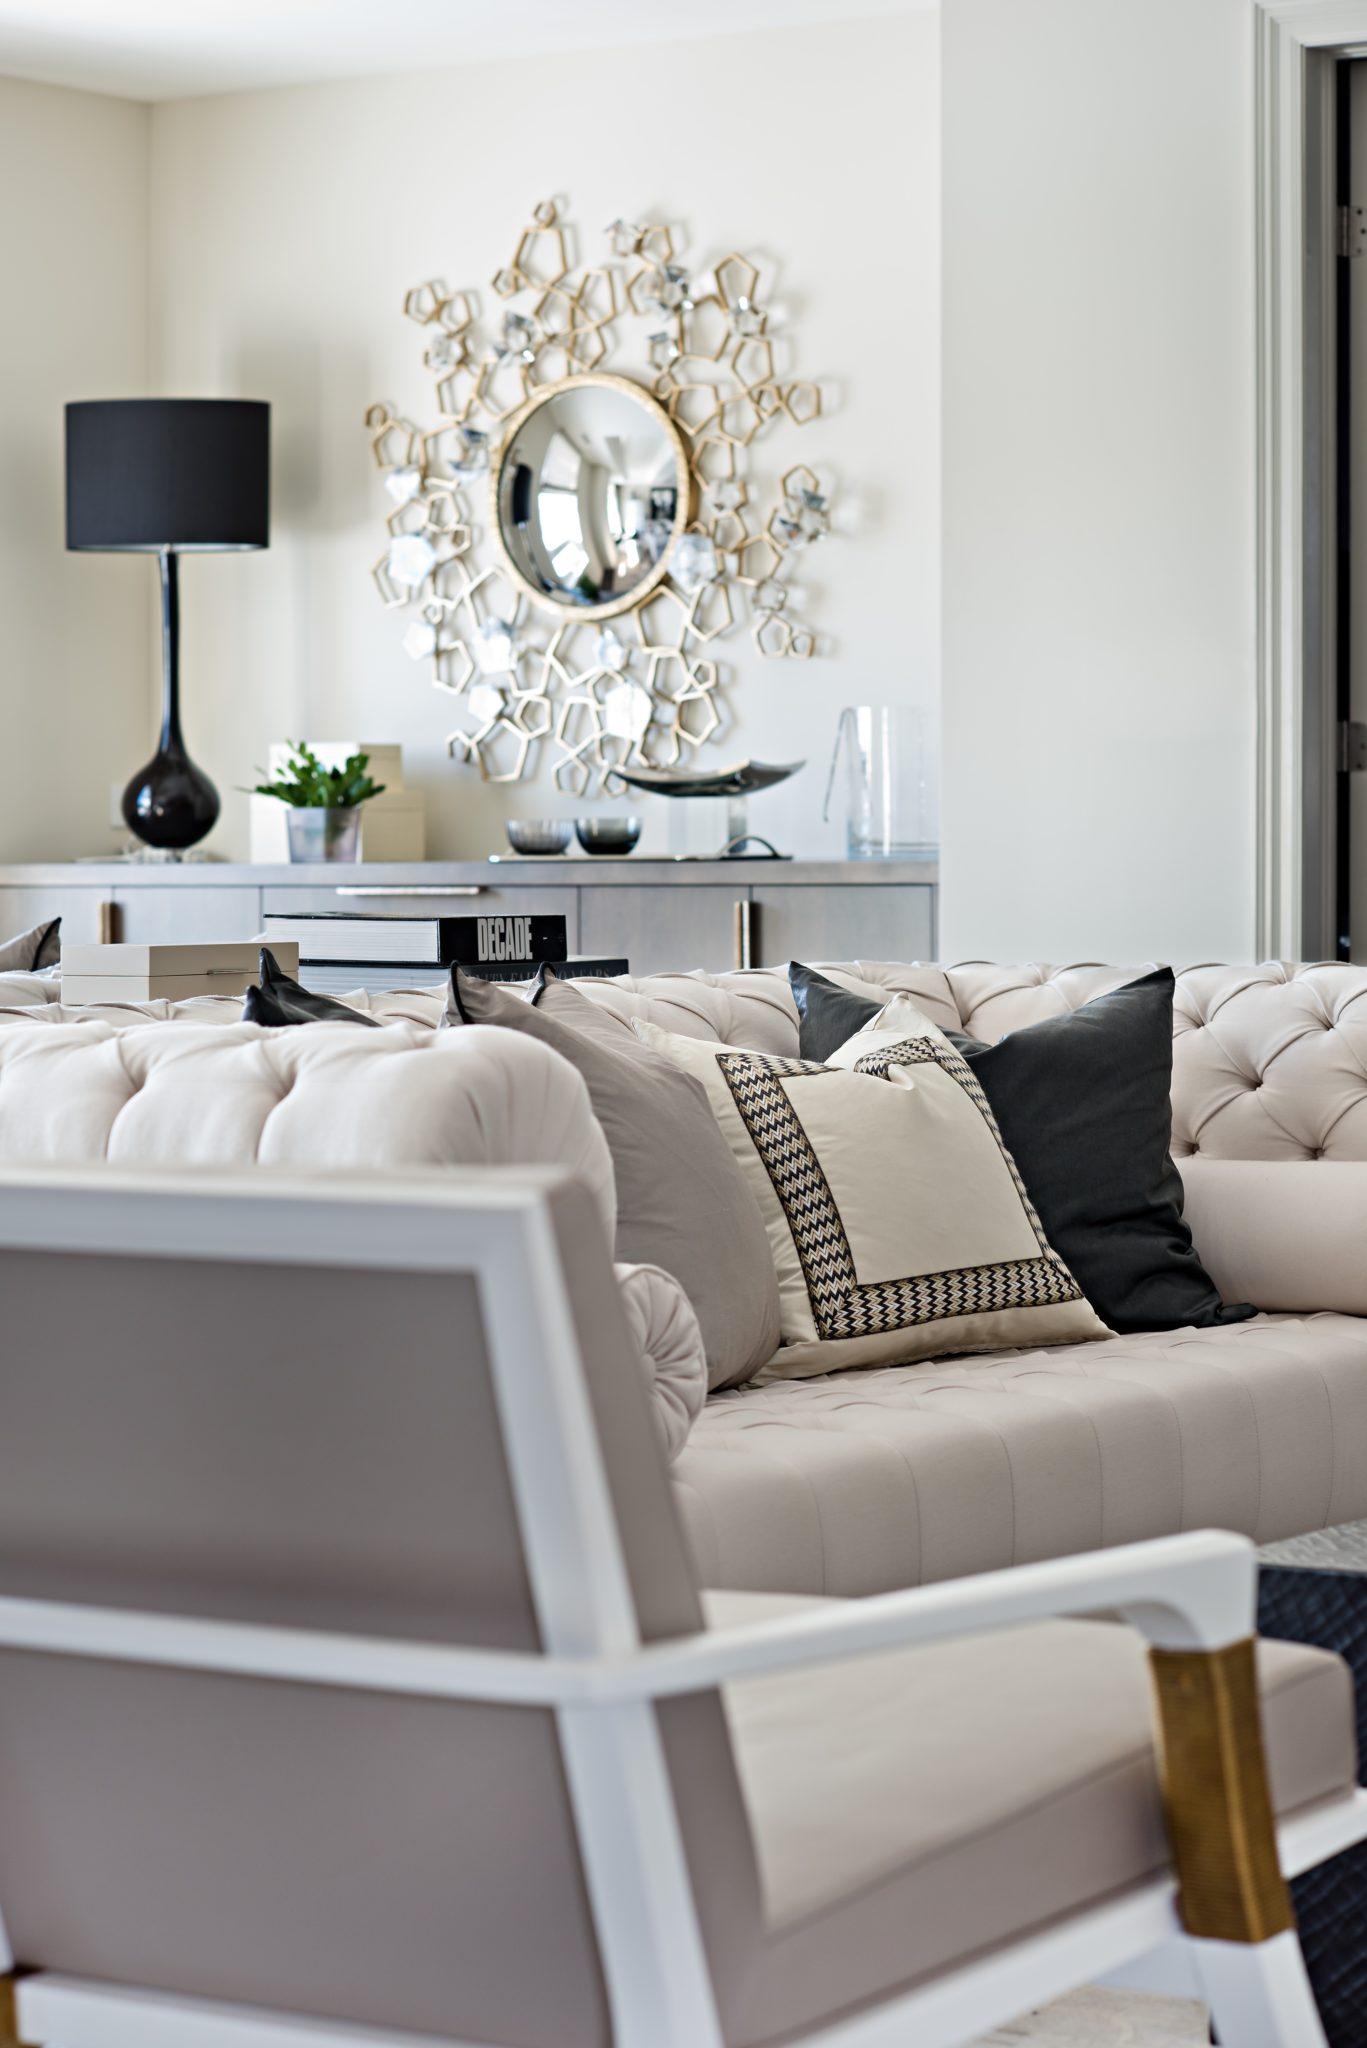 Living Room designed by Elizabeth Metcalfe Interiors & Design Inc. by Elizabeth Metcalfe Interiors & Design Inc.